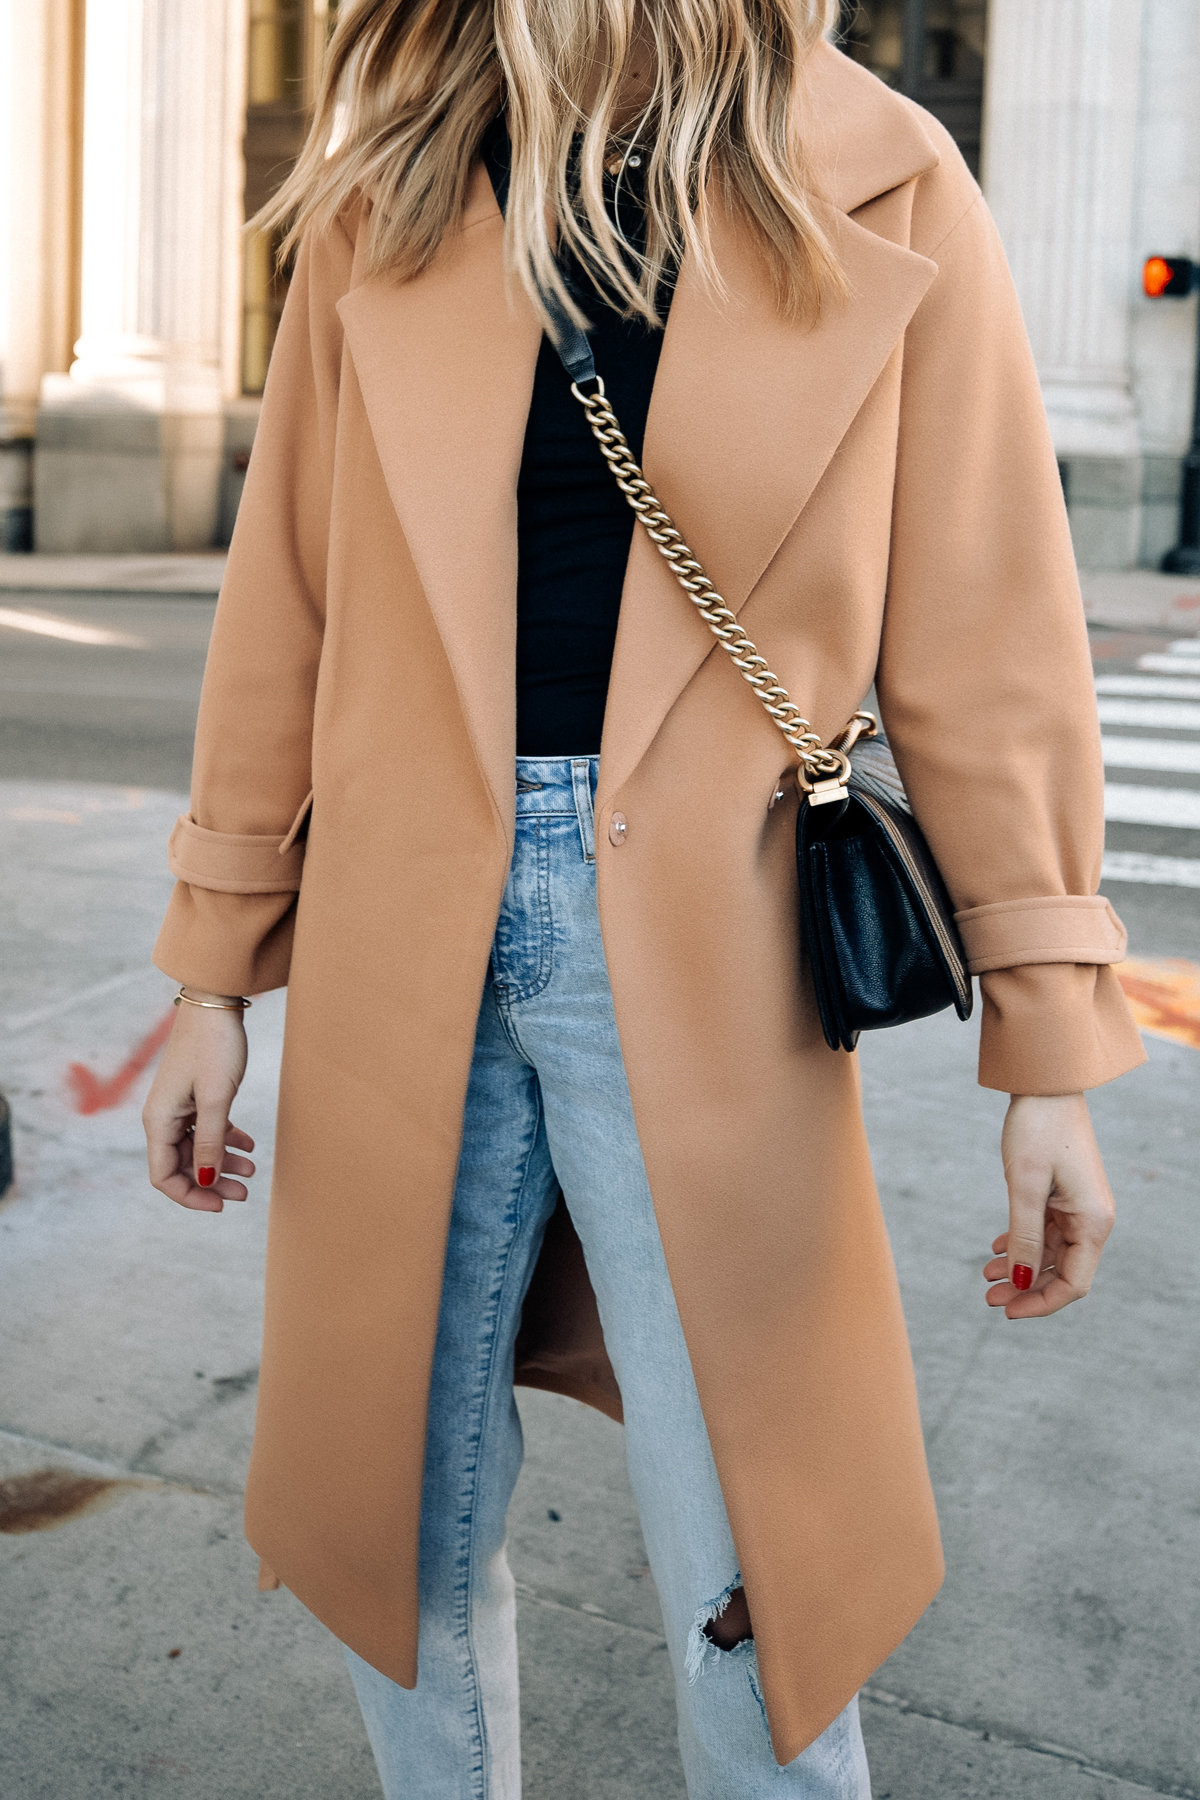 Fashion Jackson Wearing Express Camel Coat Black Tee Ripped Jeans Black Handbag Fall Outfit 2